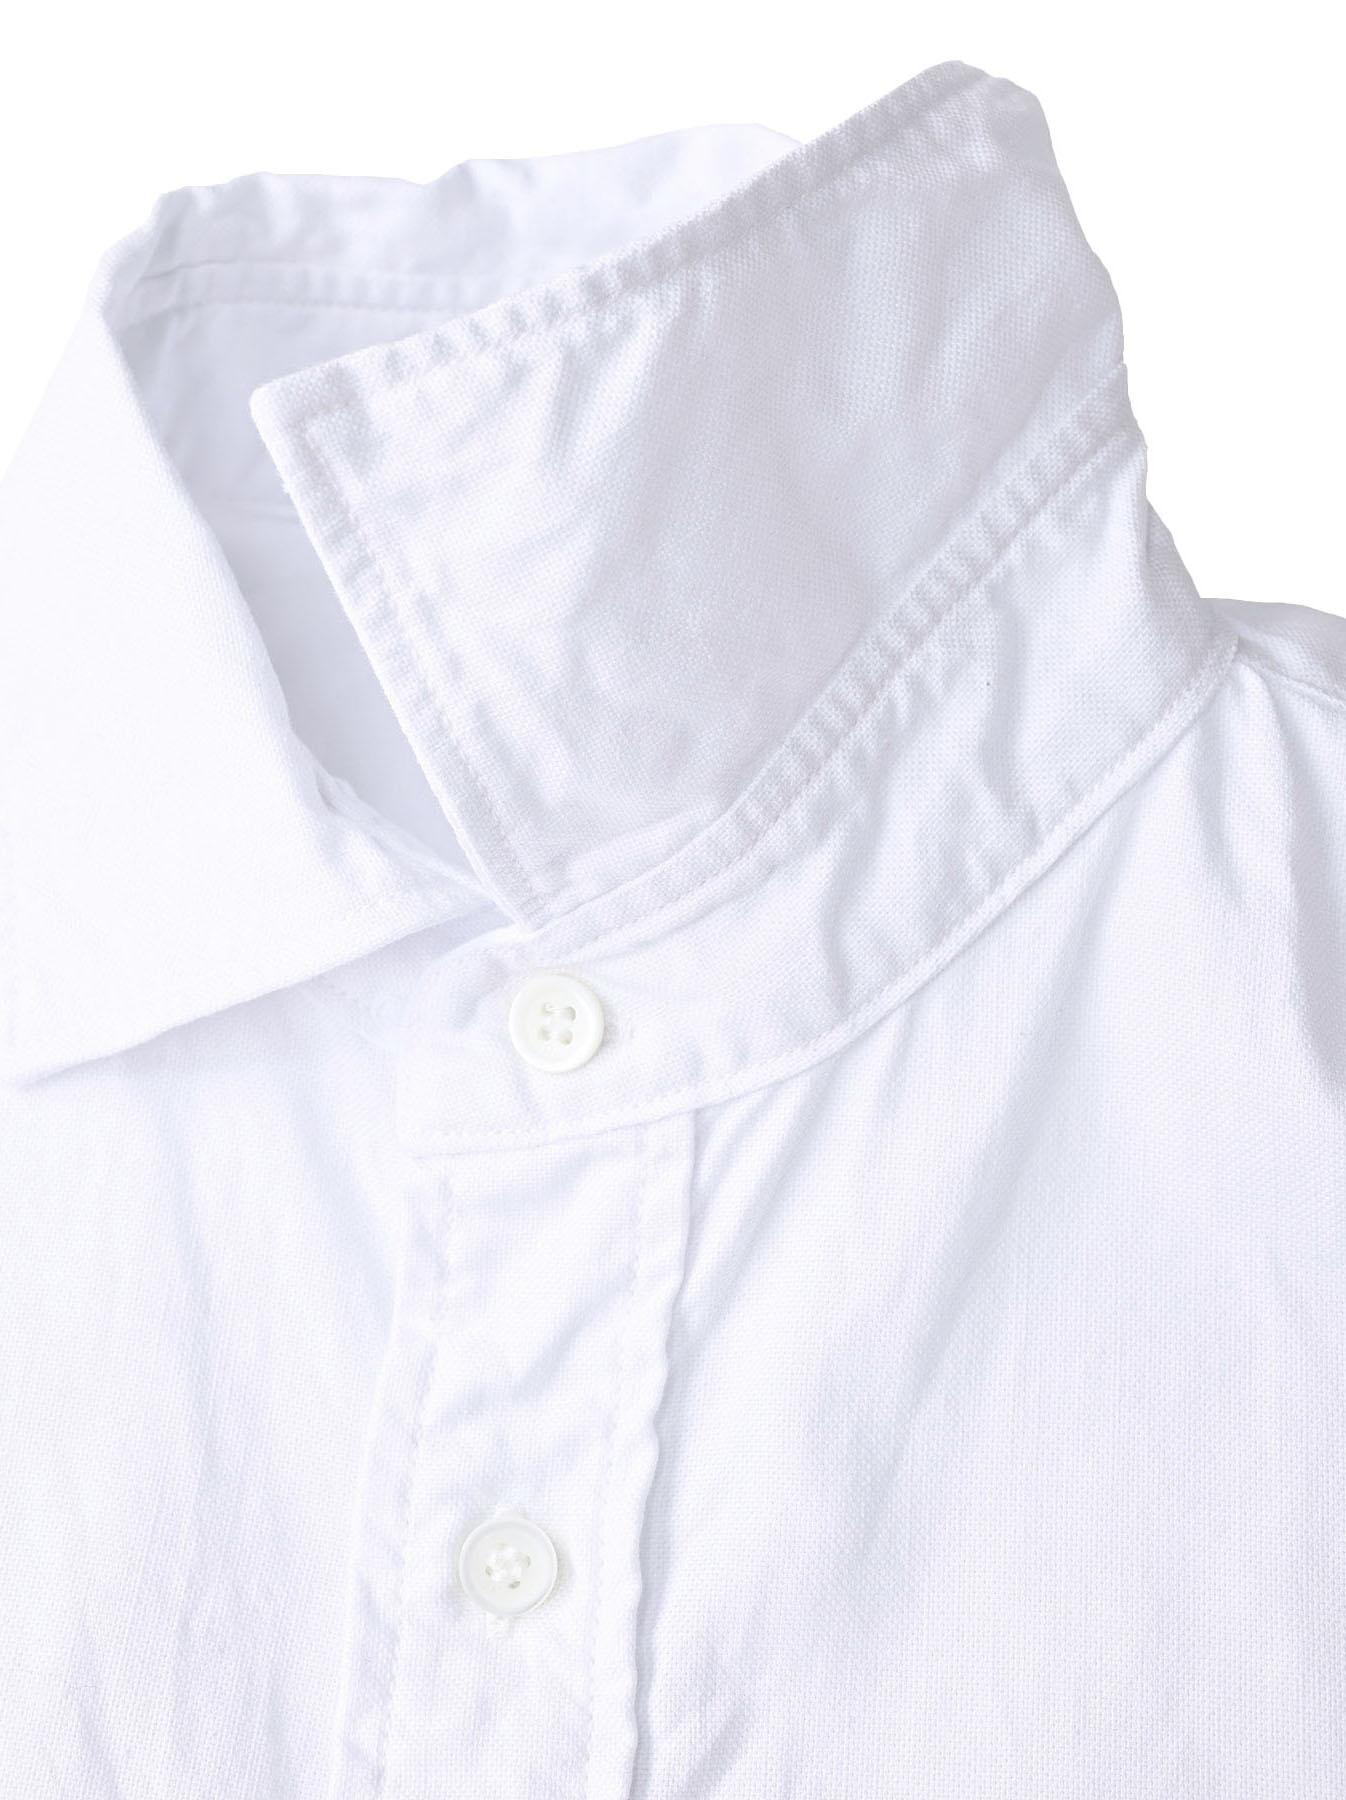 Zimbabwe Oxford 908 Regular Shirt-11